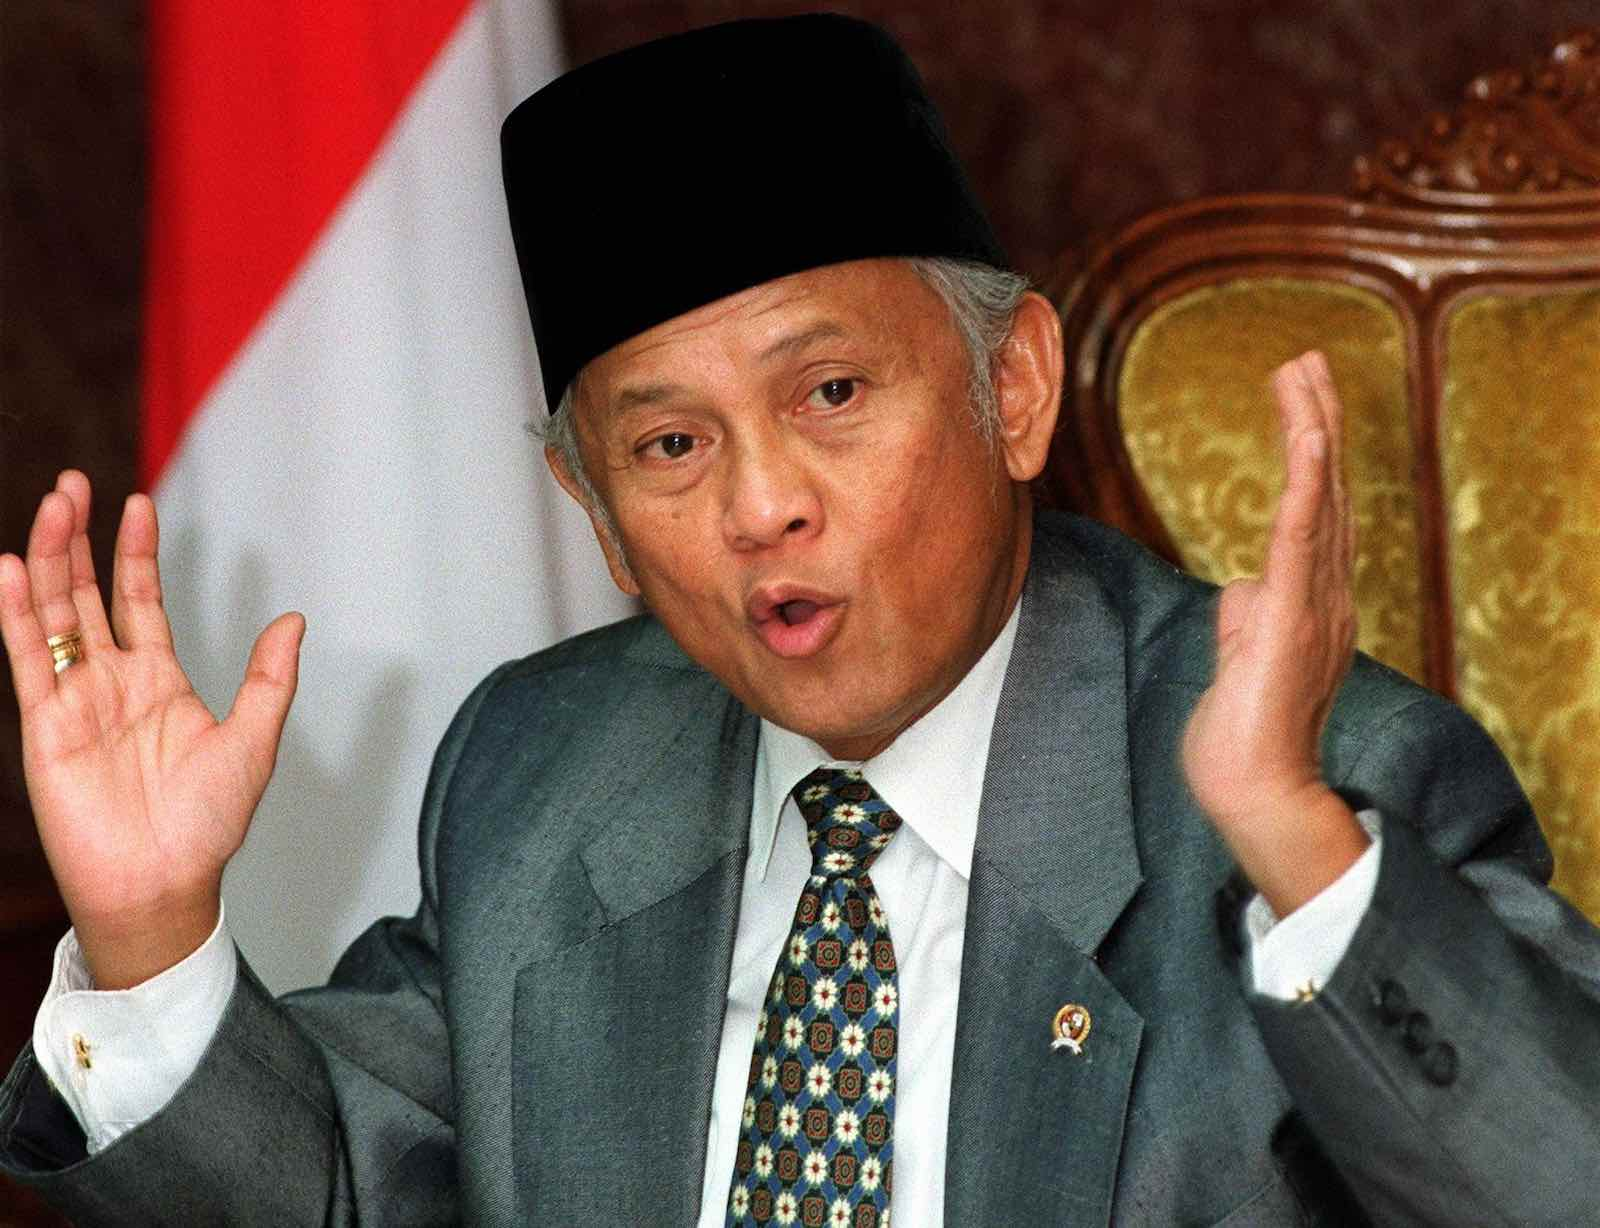 Indonesian President BJ Habibie at Bina Graha Presidential Office in Jakarta, July 1998 (Photo: Kemal Jufri via Getty)